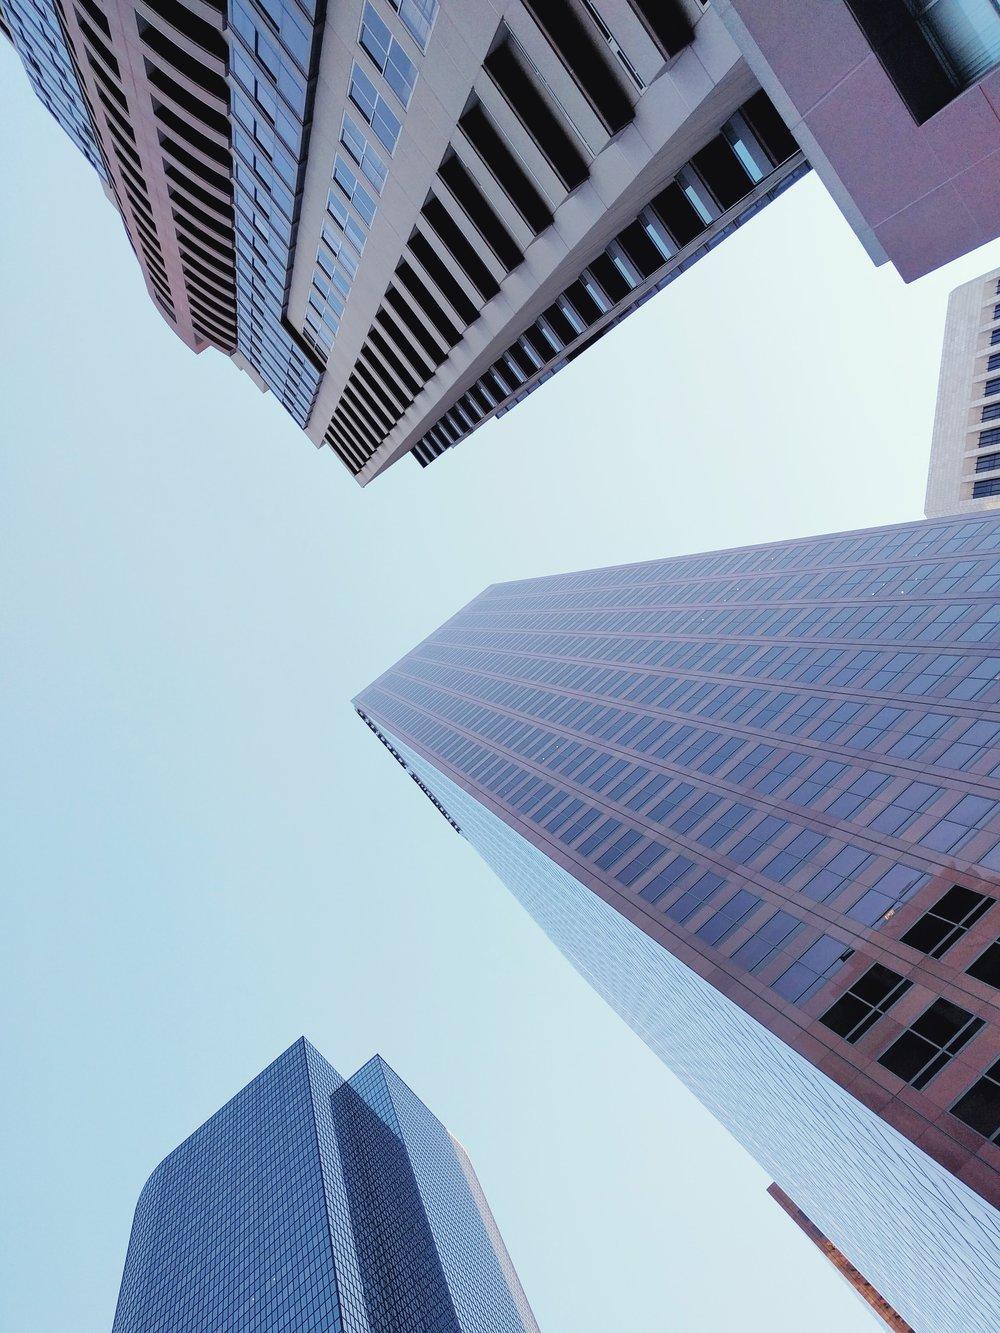 downtown-la-skyscrapers-worms-eye-view-los-angeles